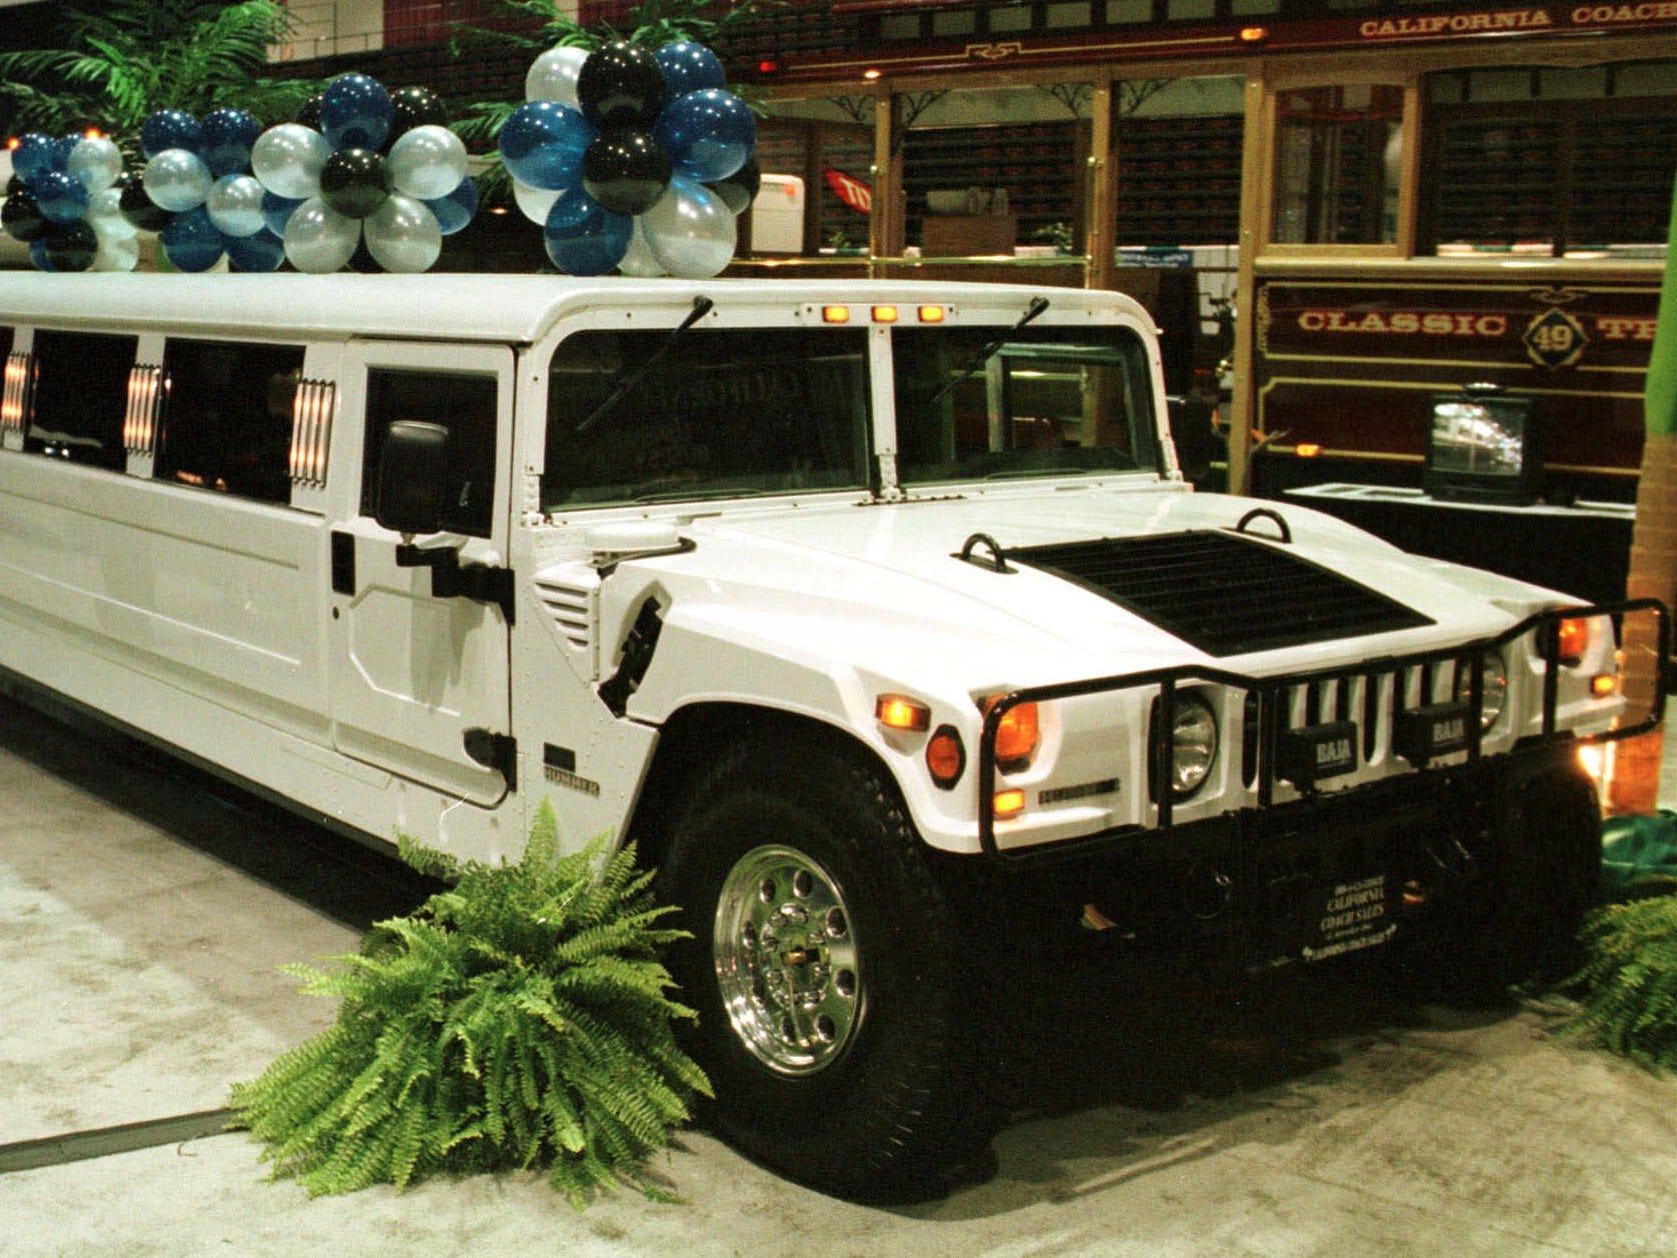 A 1999 stretch Hummer Limo at the Trump Taj Mahal Casino Resort in Atlantic City, N.J., Nov. 9, 1998.